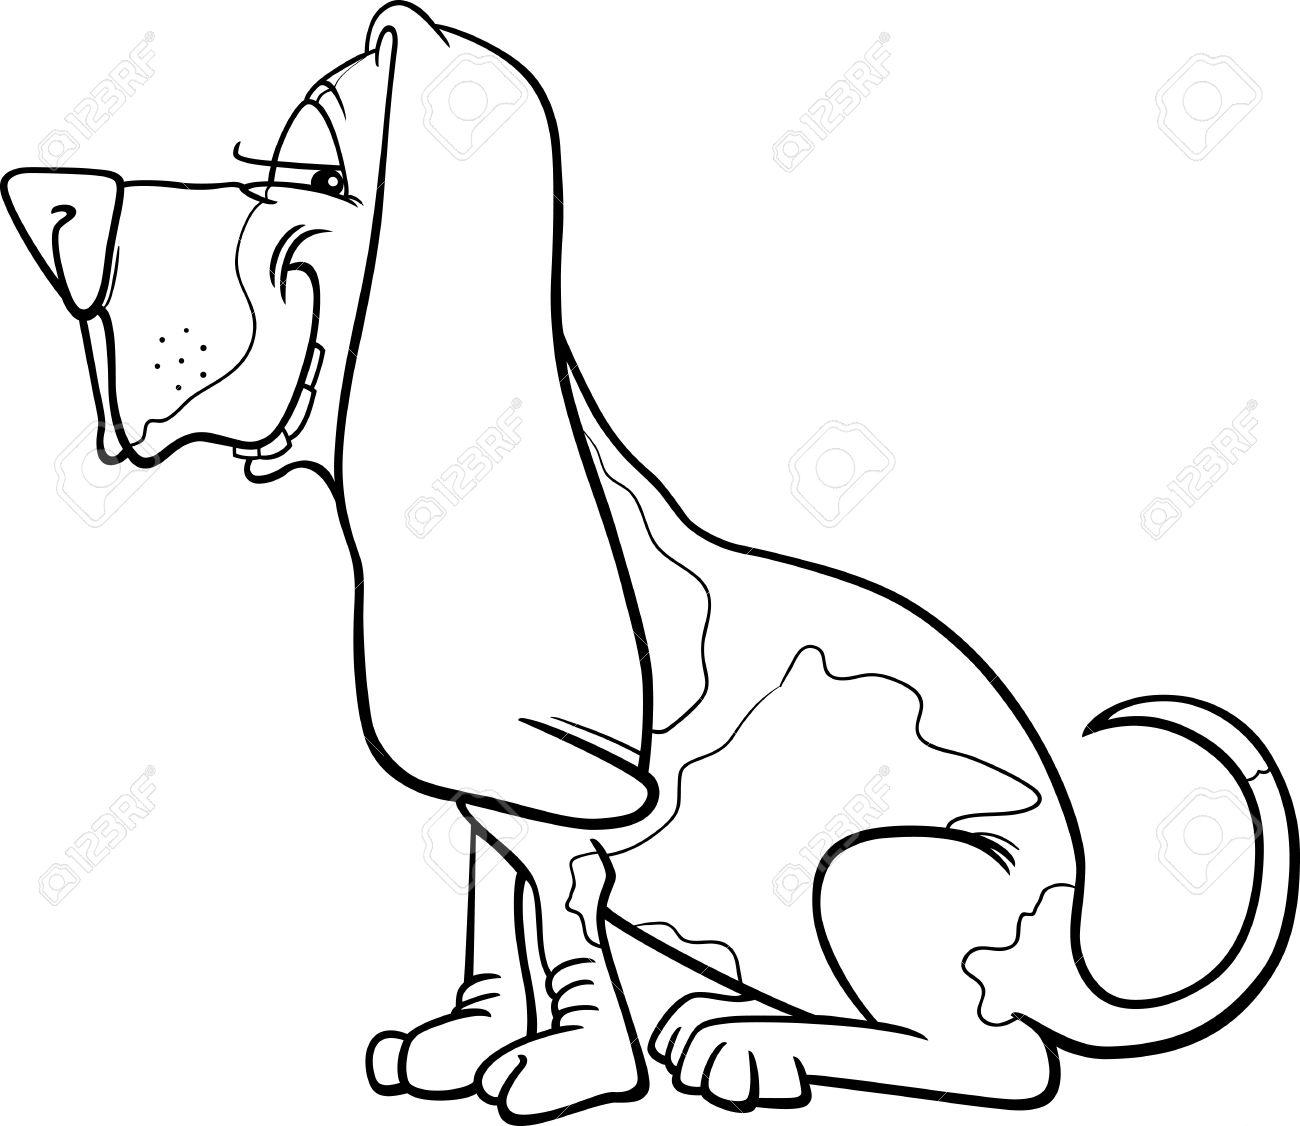 Coon Dog Drawing At Getdrawings